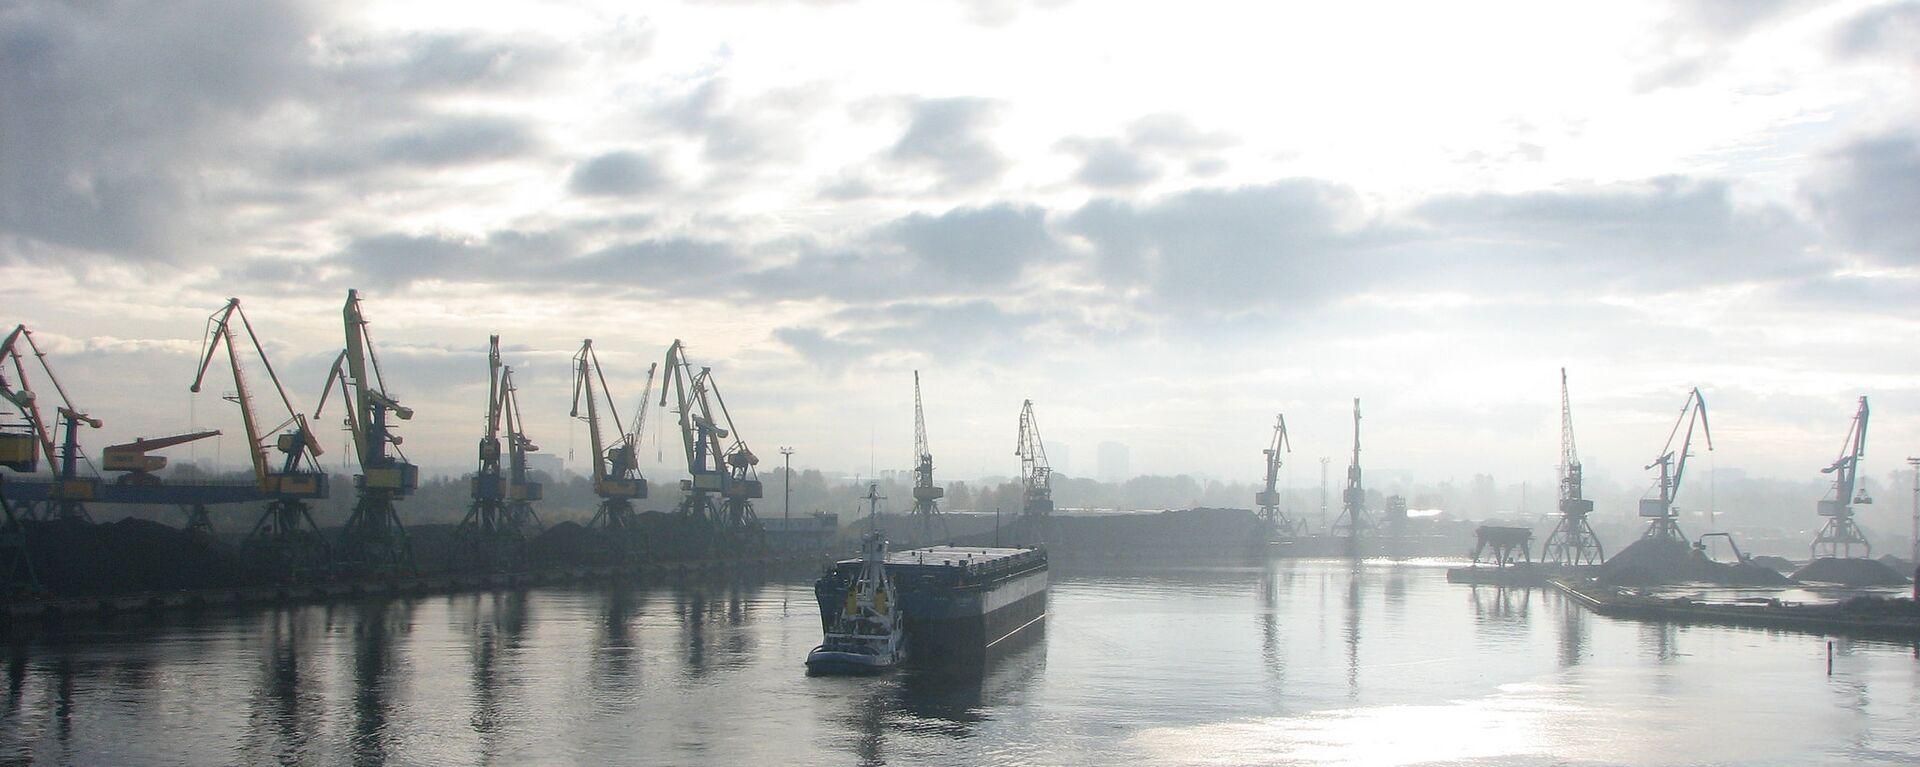 Рижский порт - Sputnik Latvija, 1920, 05.05.2021